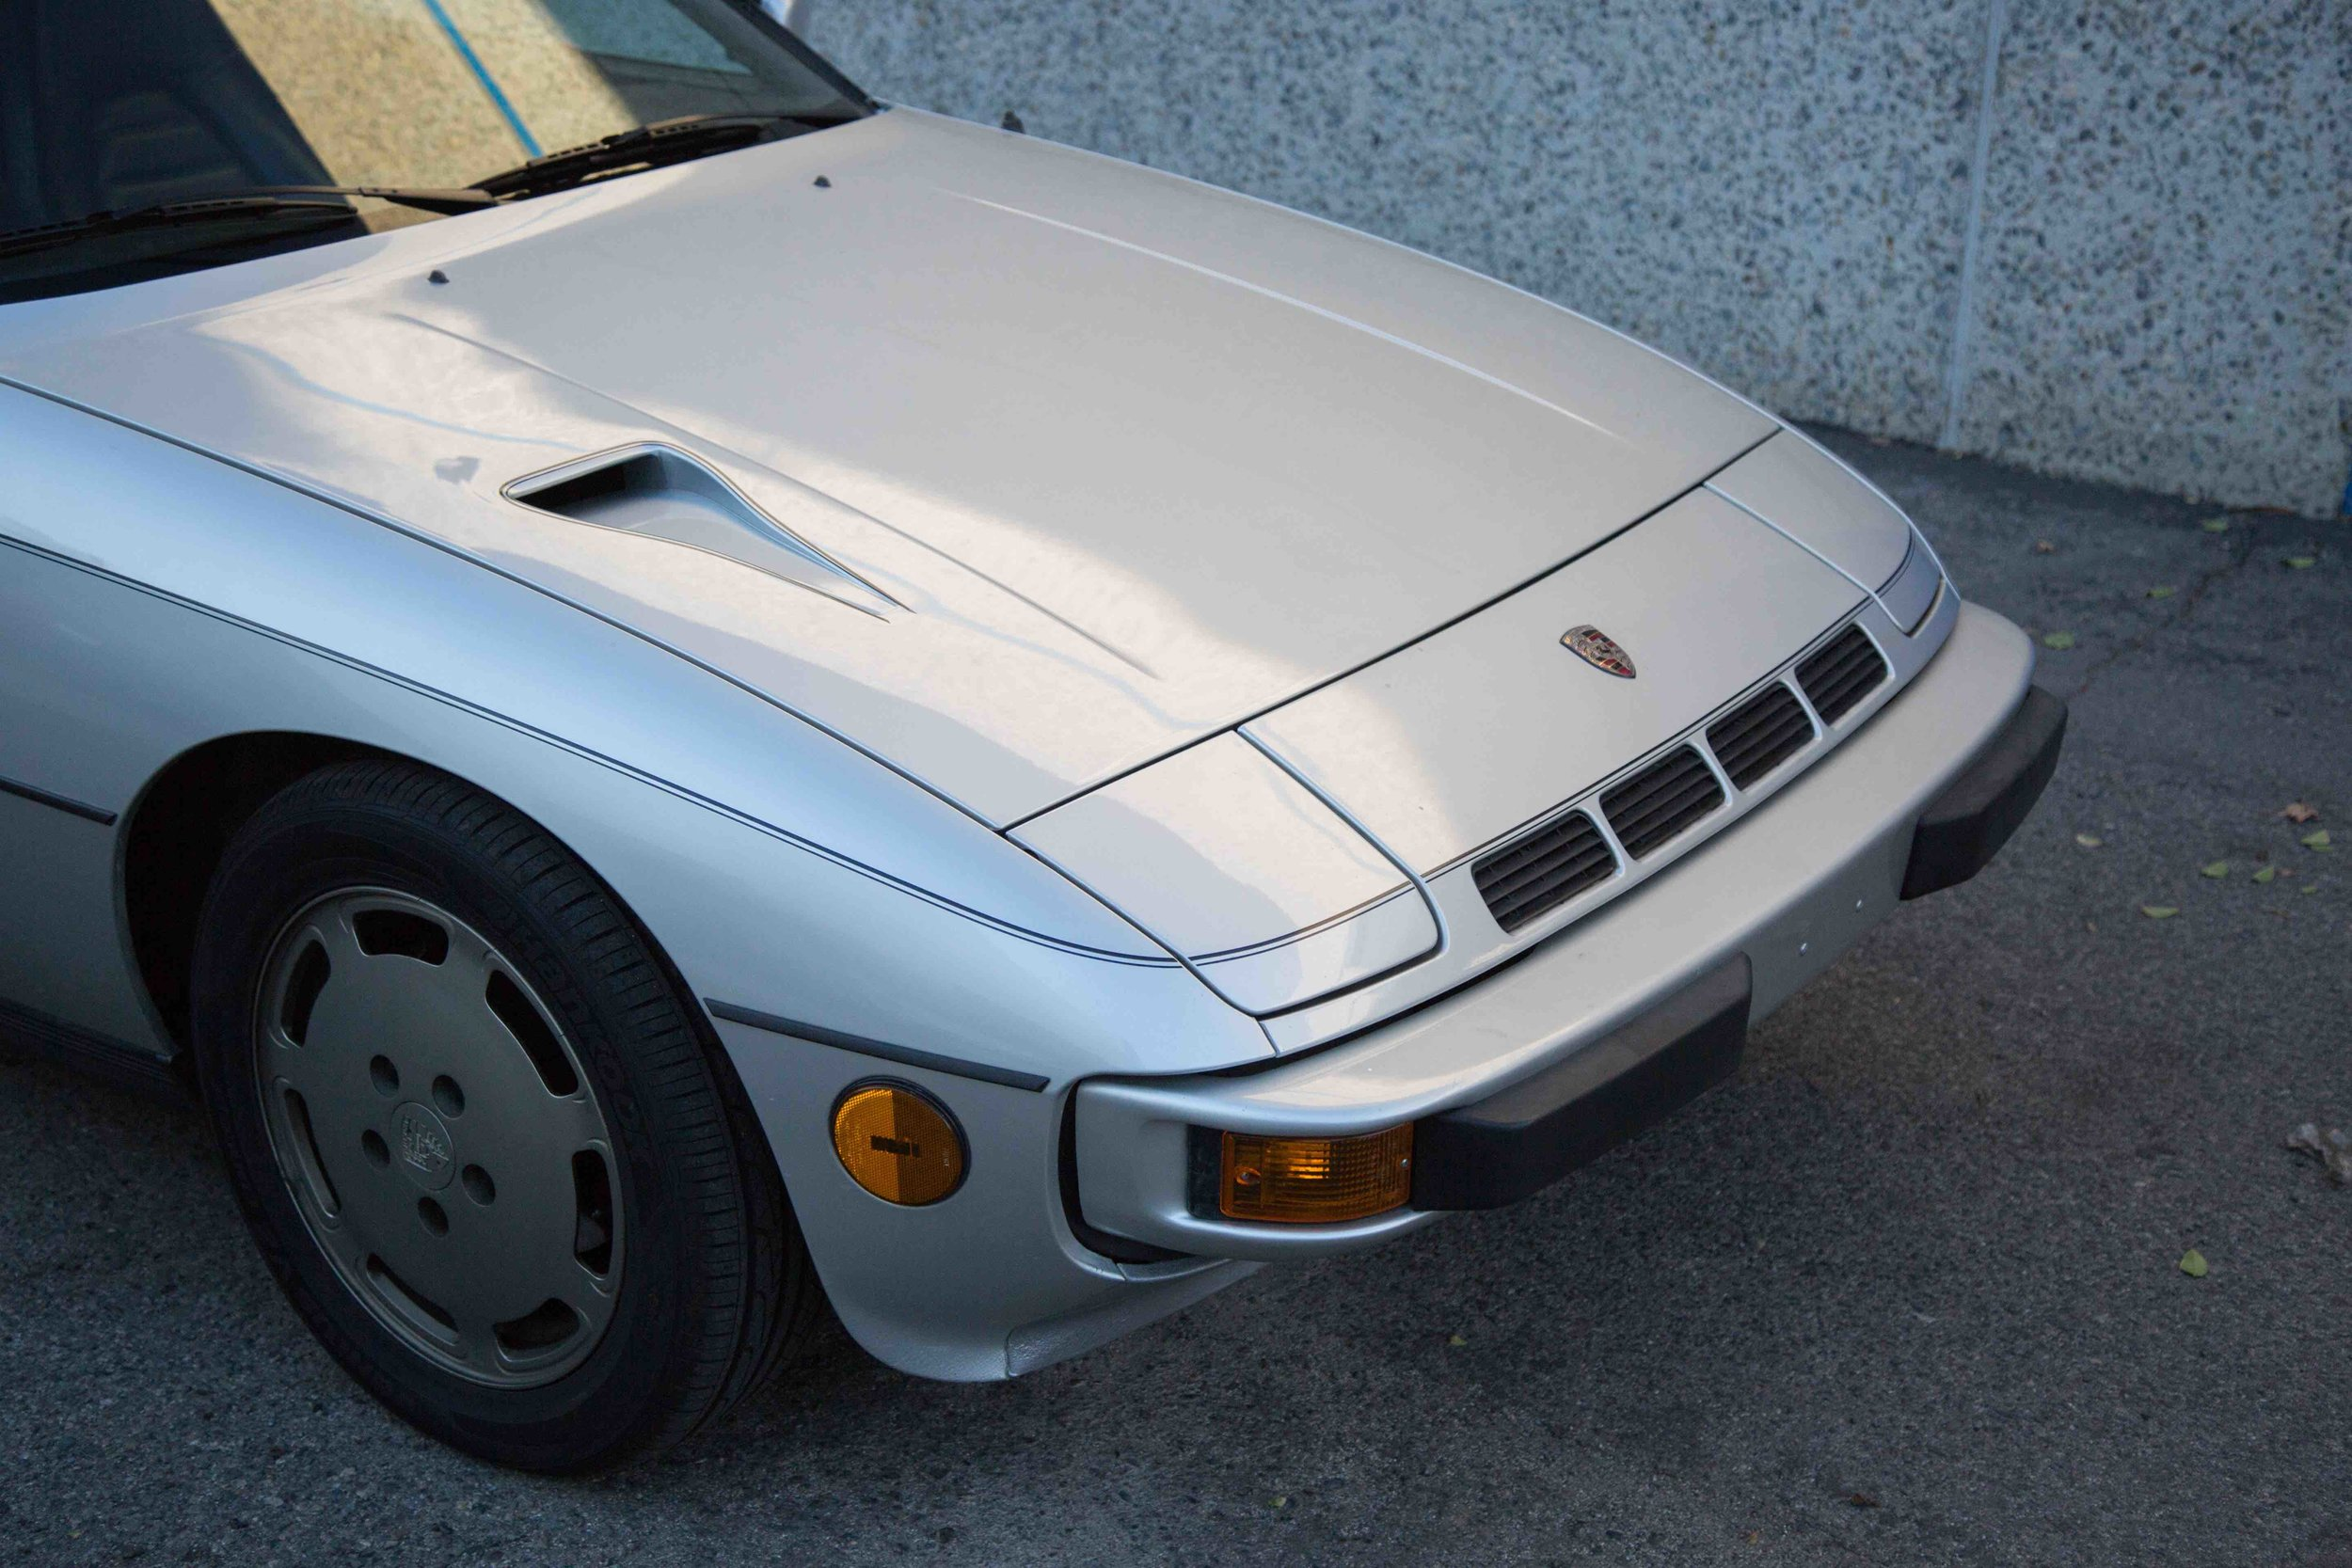 1980-924-Turbo-hood-view-makellos-classics.jpeg